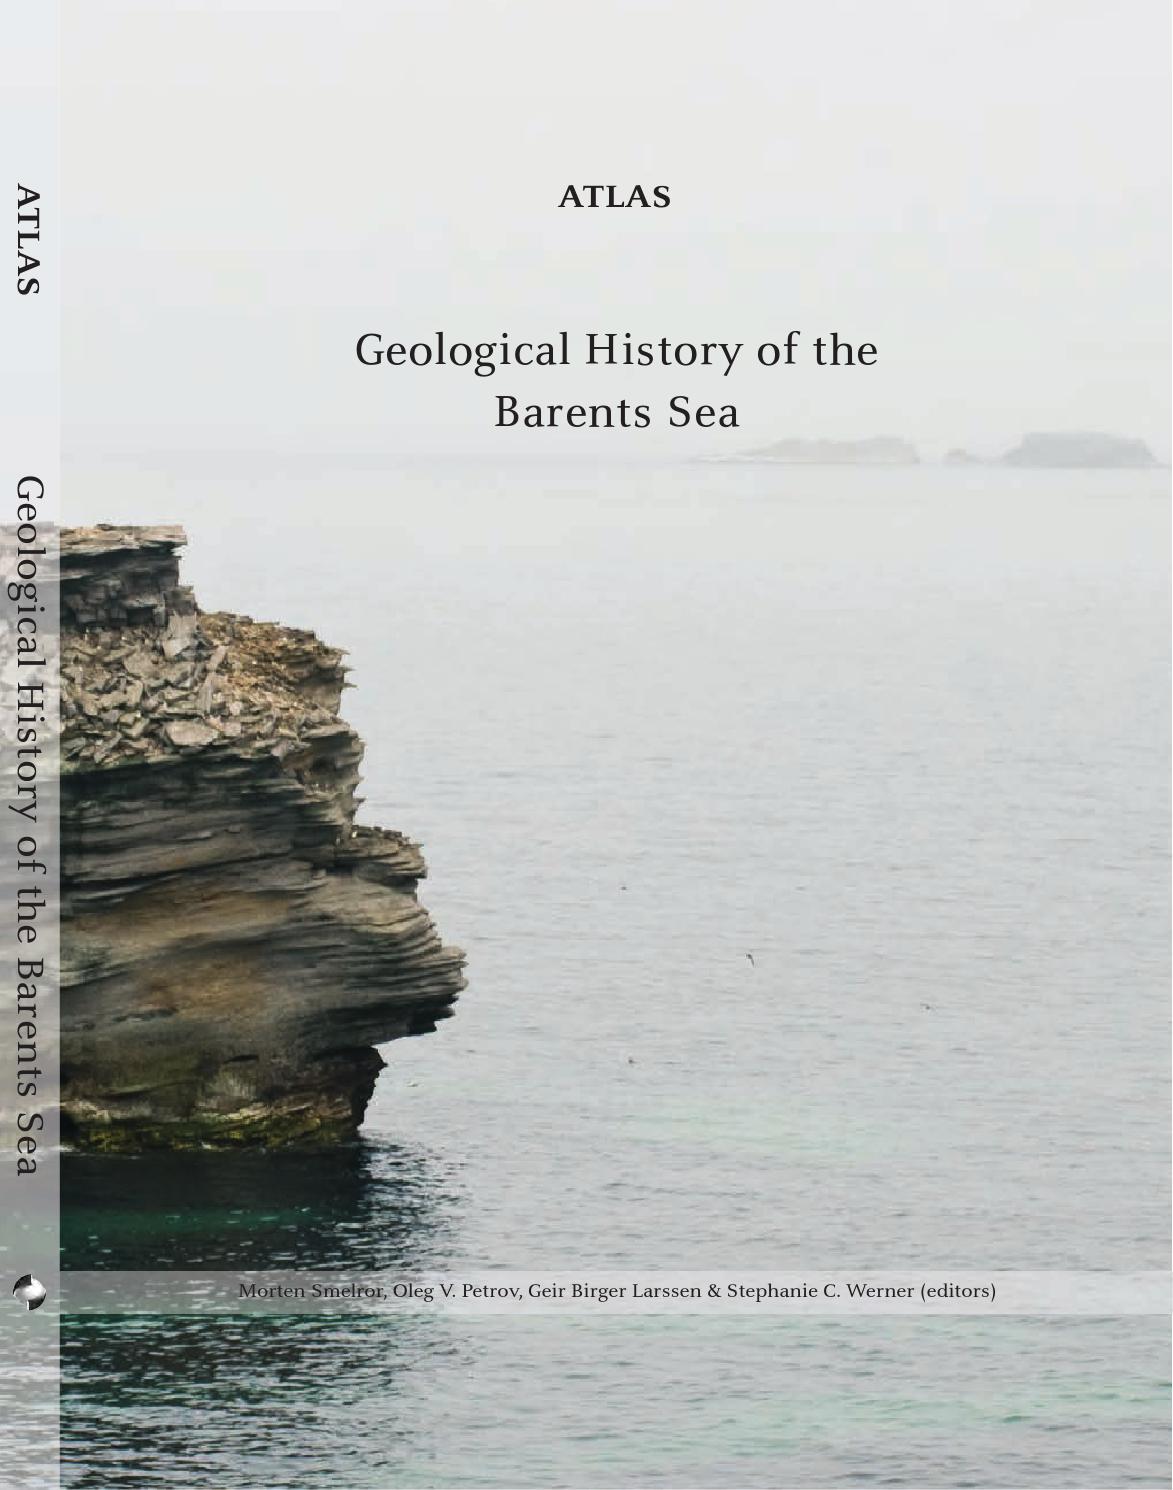 barents sea geology - photo #33